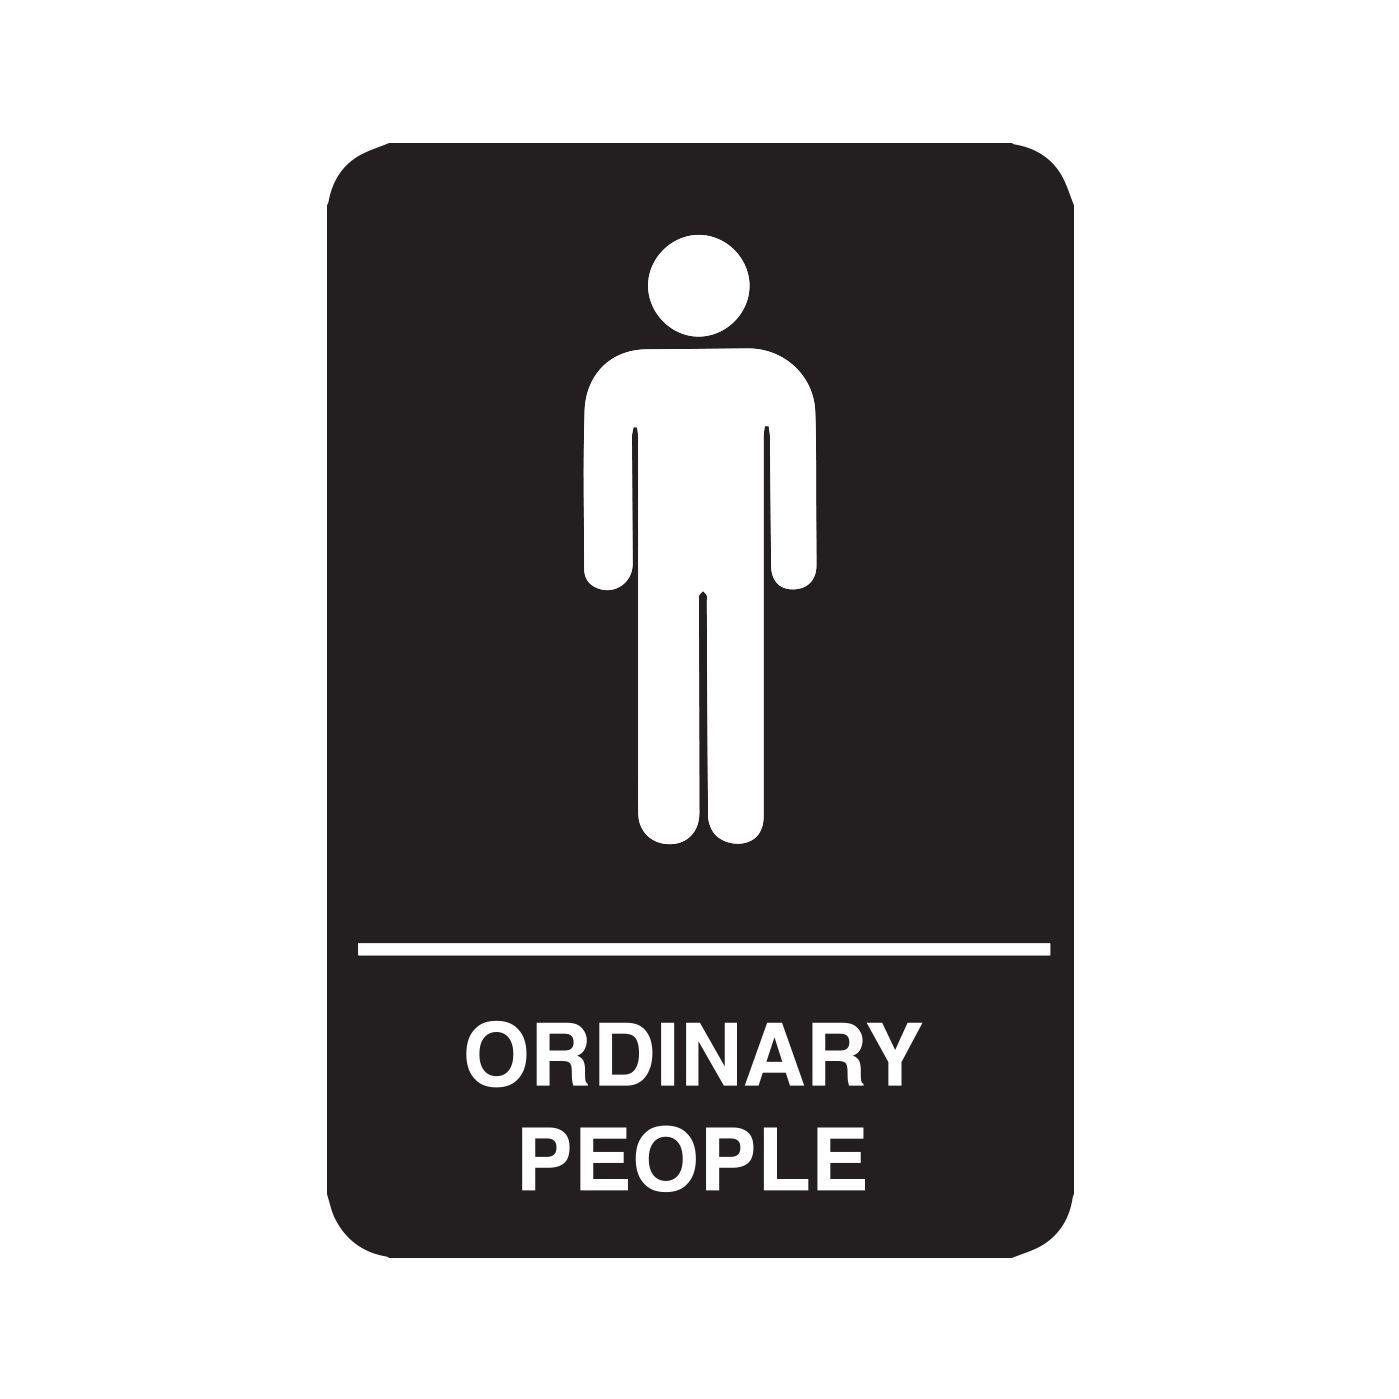 ORDINARY PEOPLE 003